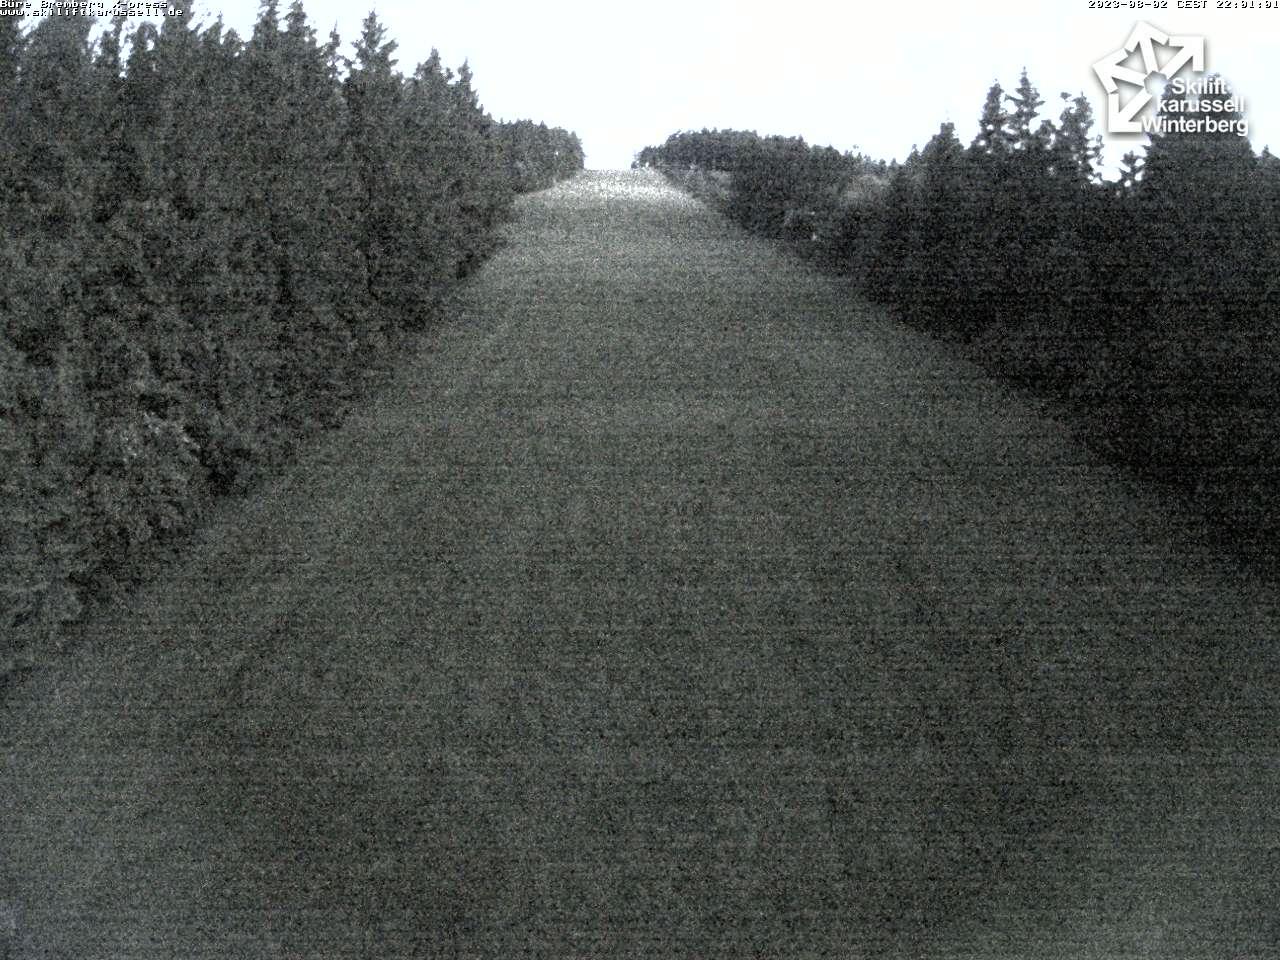 Webcam Bremberglift - Skiliftkarussell Winterberg